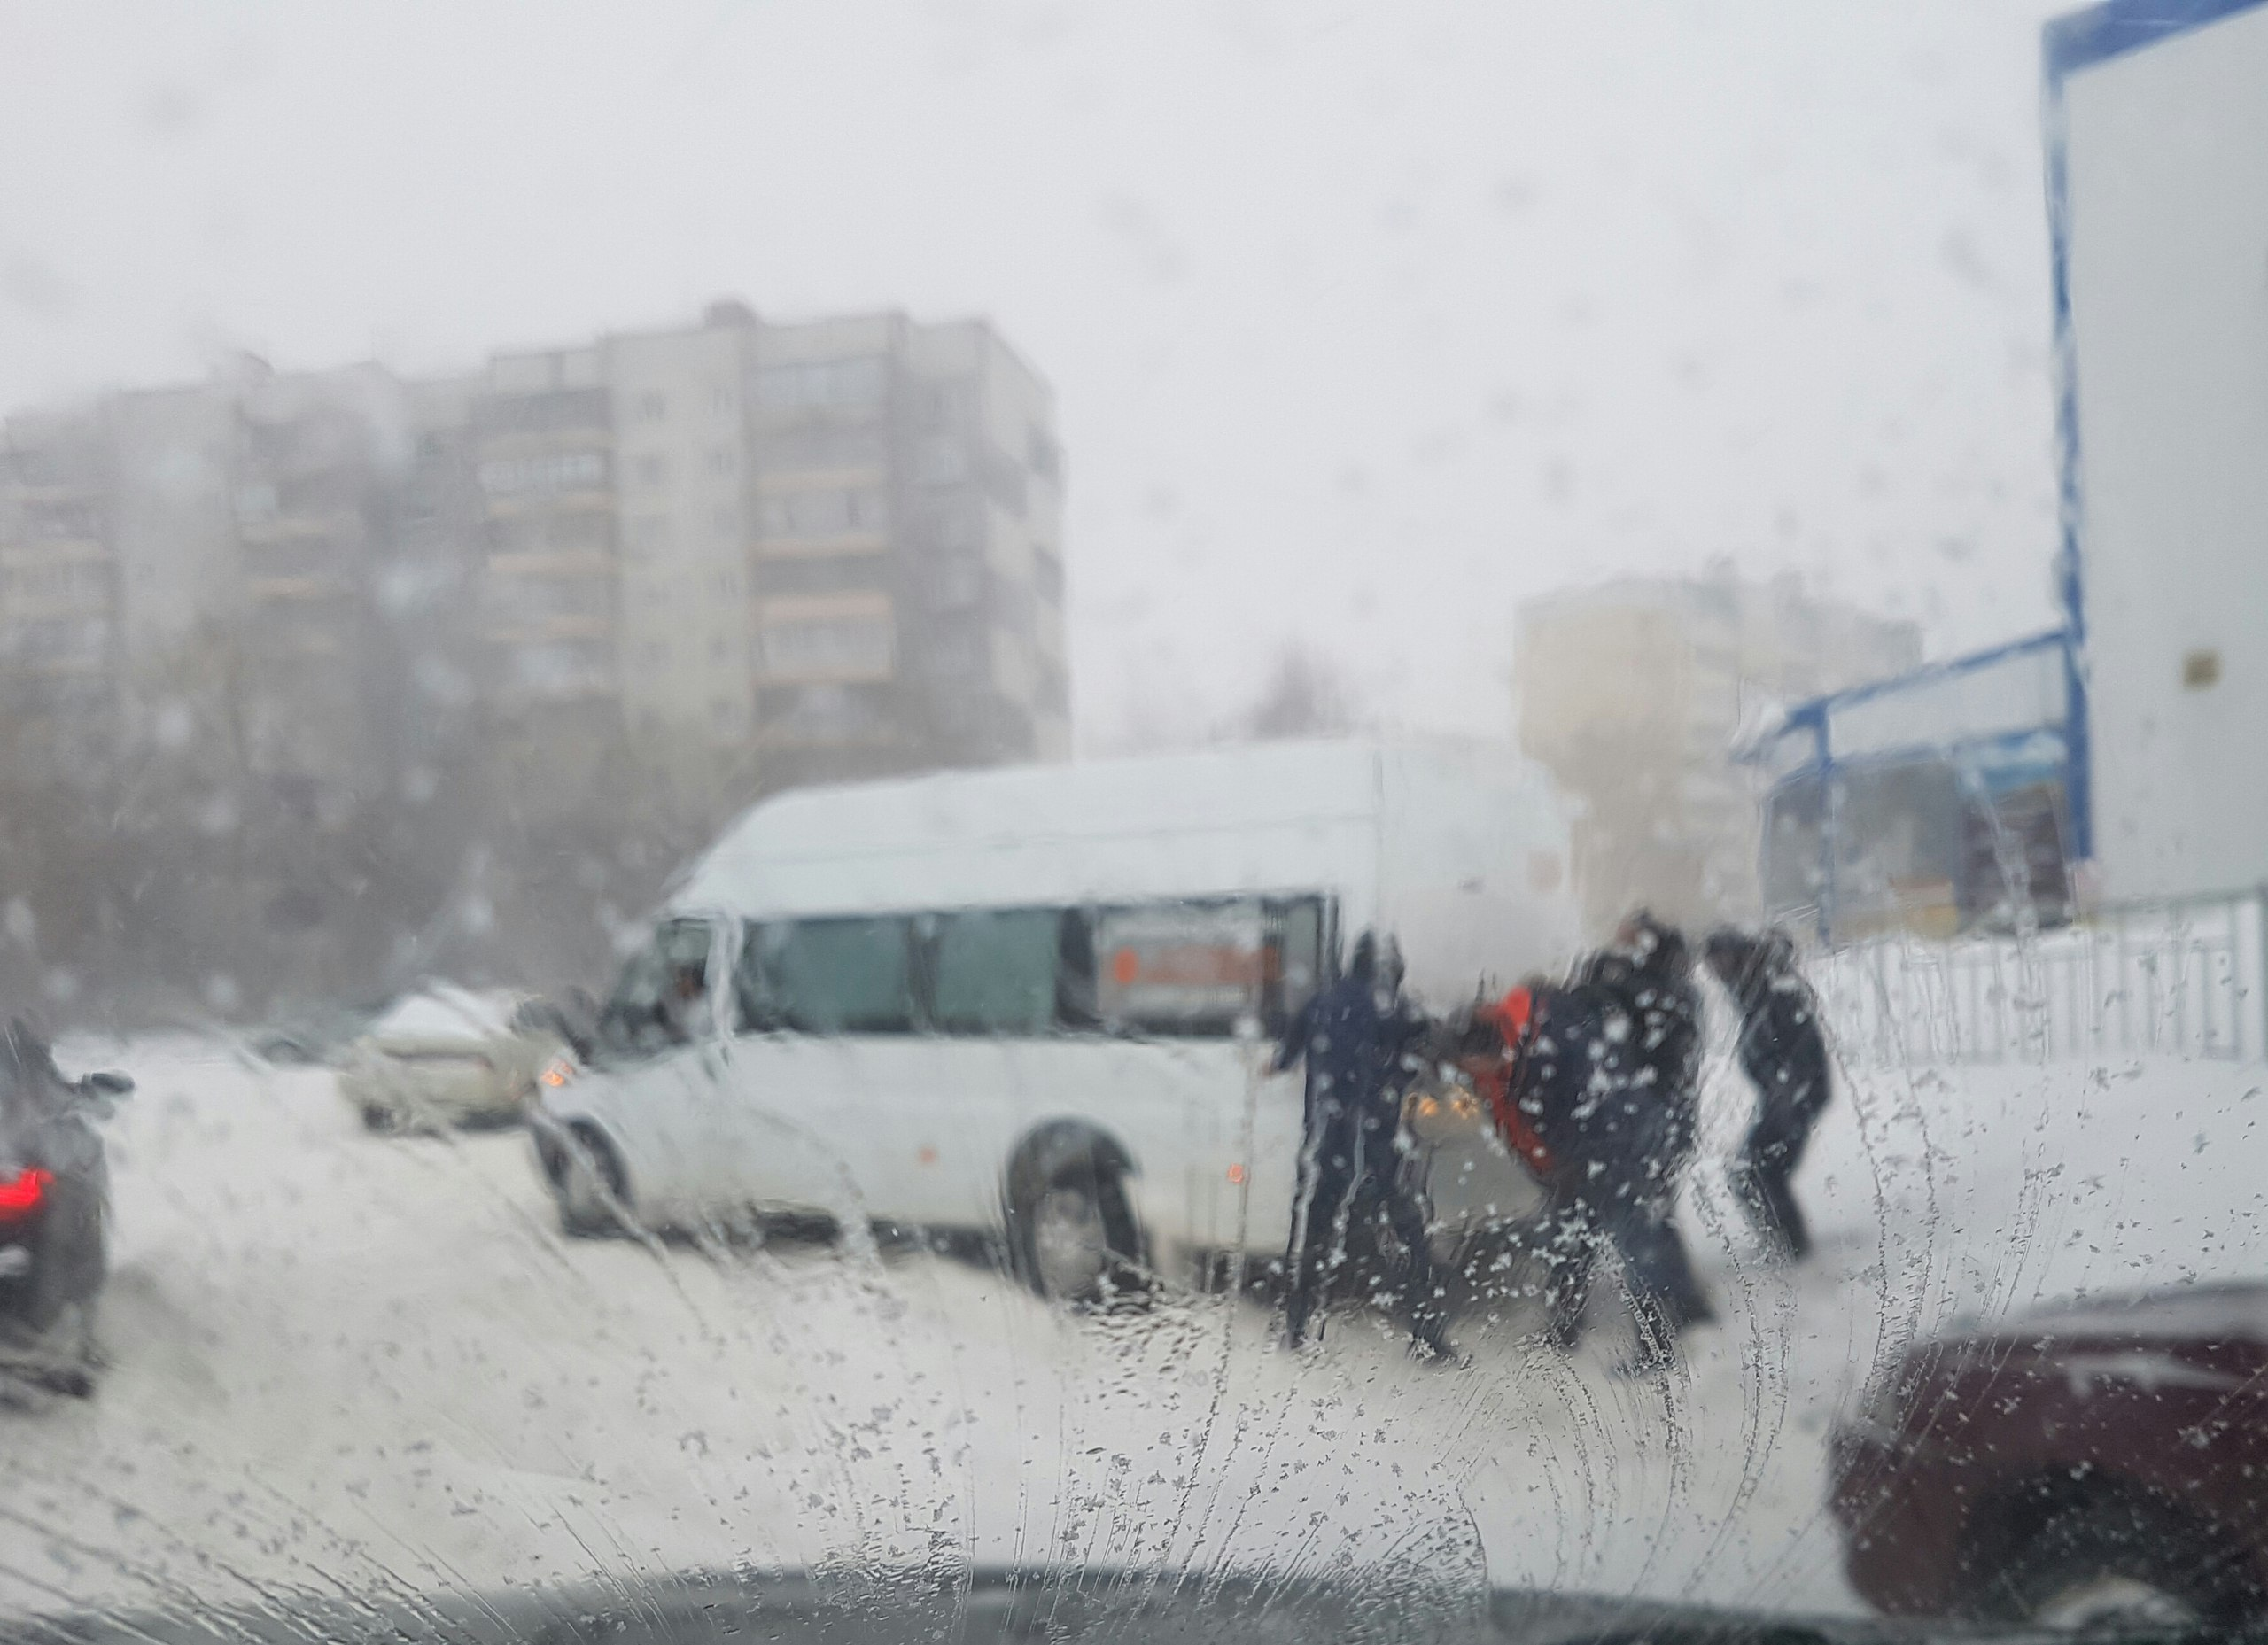 Погоны полиции россии расстояние между звездами схема: http://kupidca.ru/32679-pogony-policii-rossii-rasstoyanie-mezhdu-zvezdami-sxema